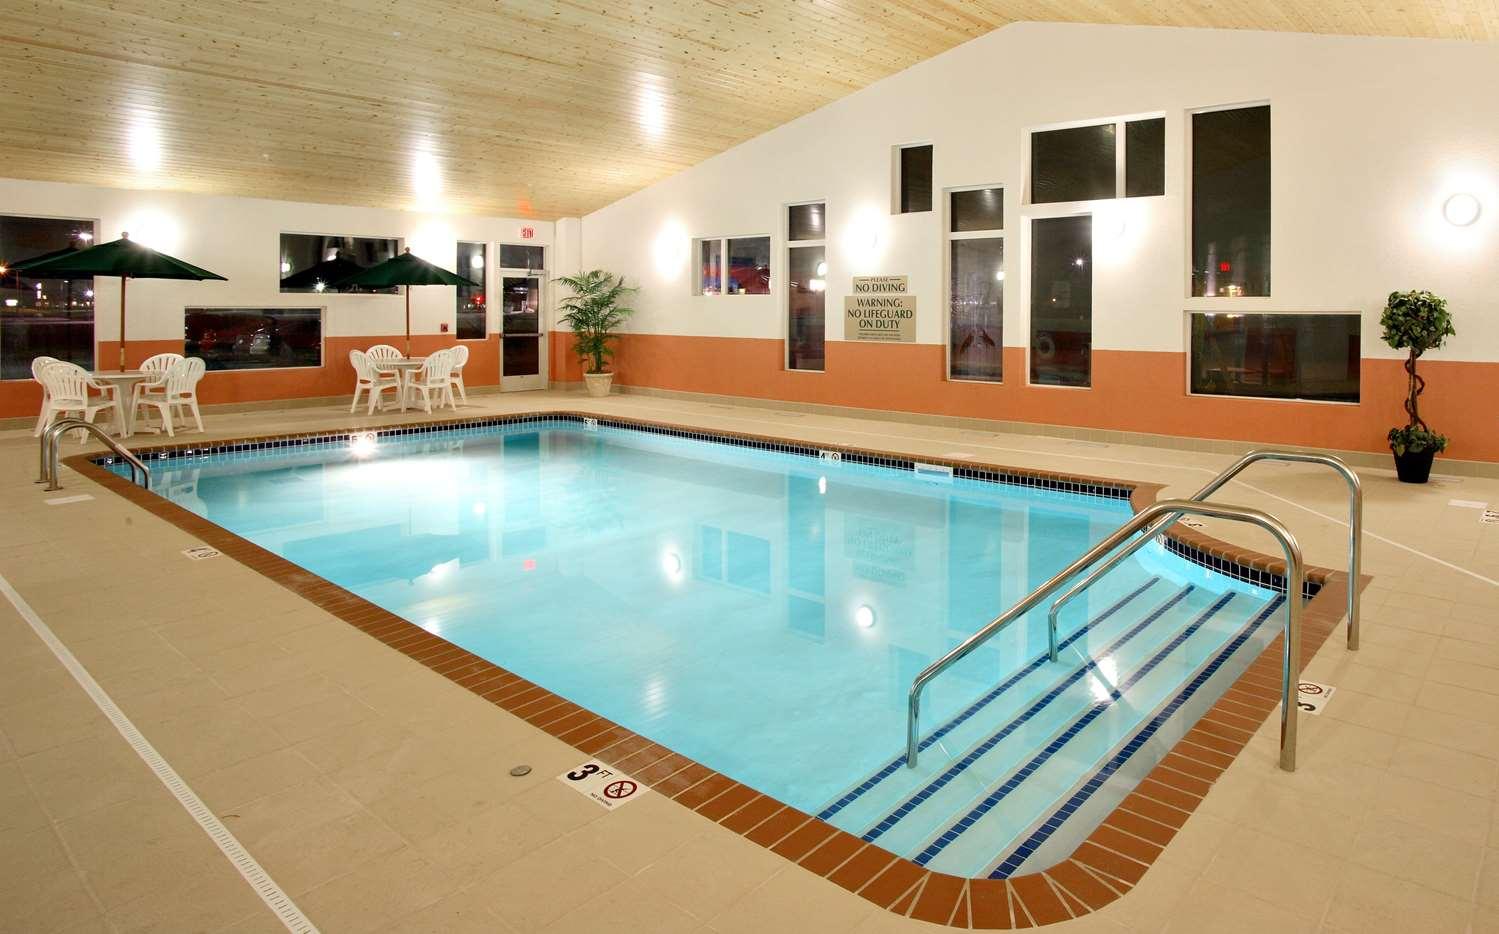 Pool - Grandstay Hotel & Suites Pipestone